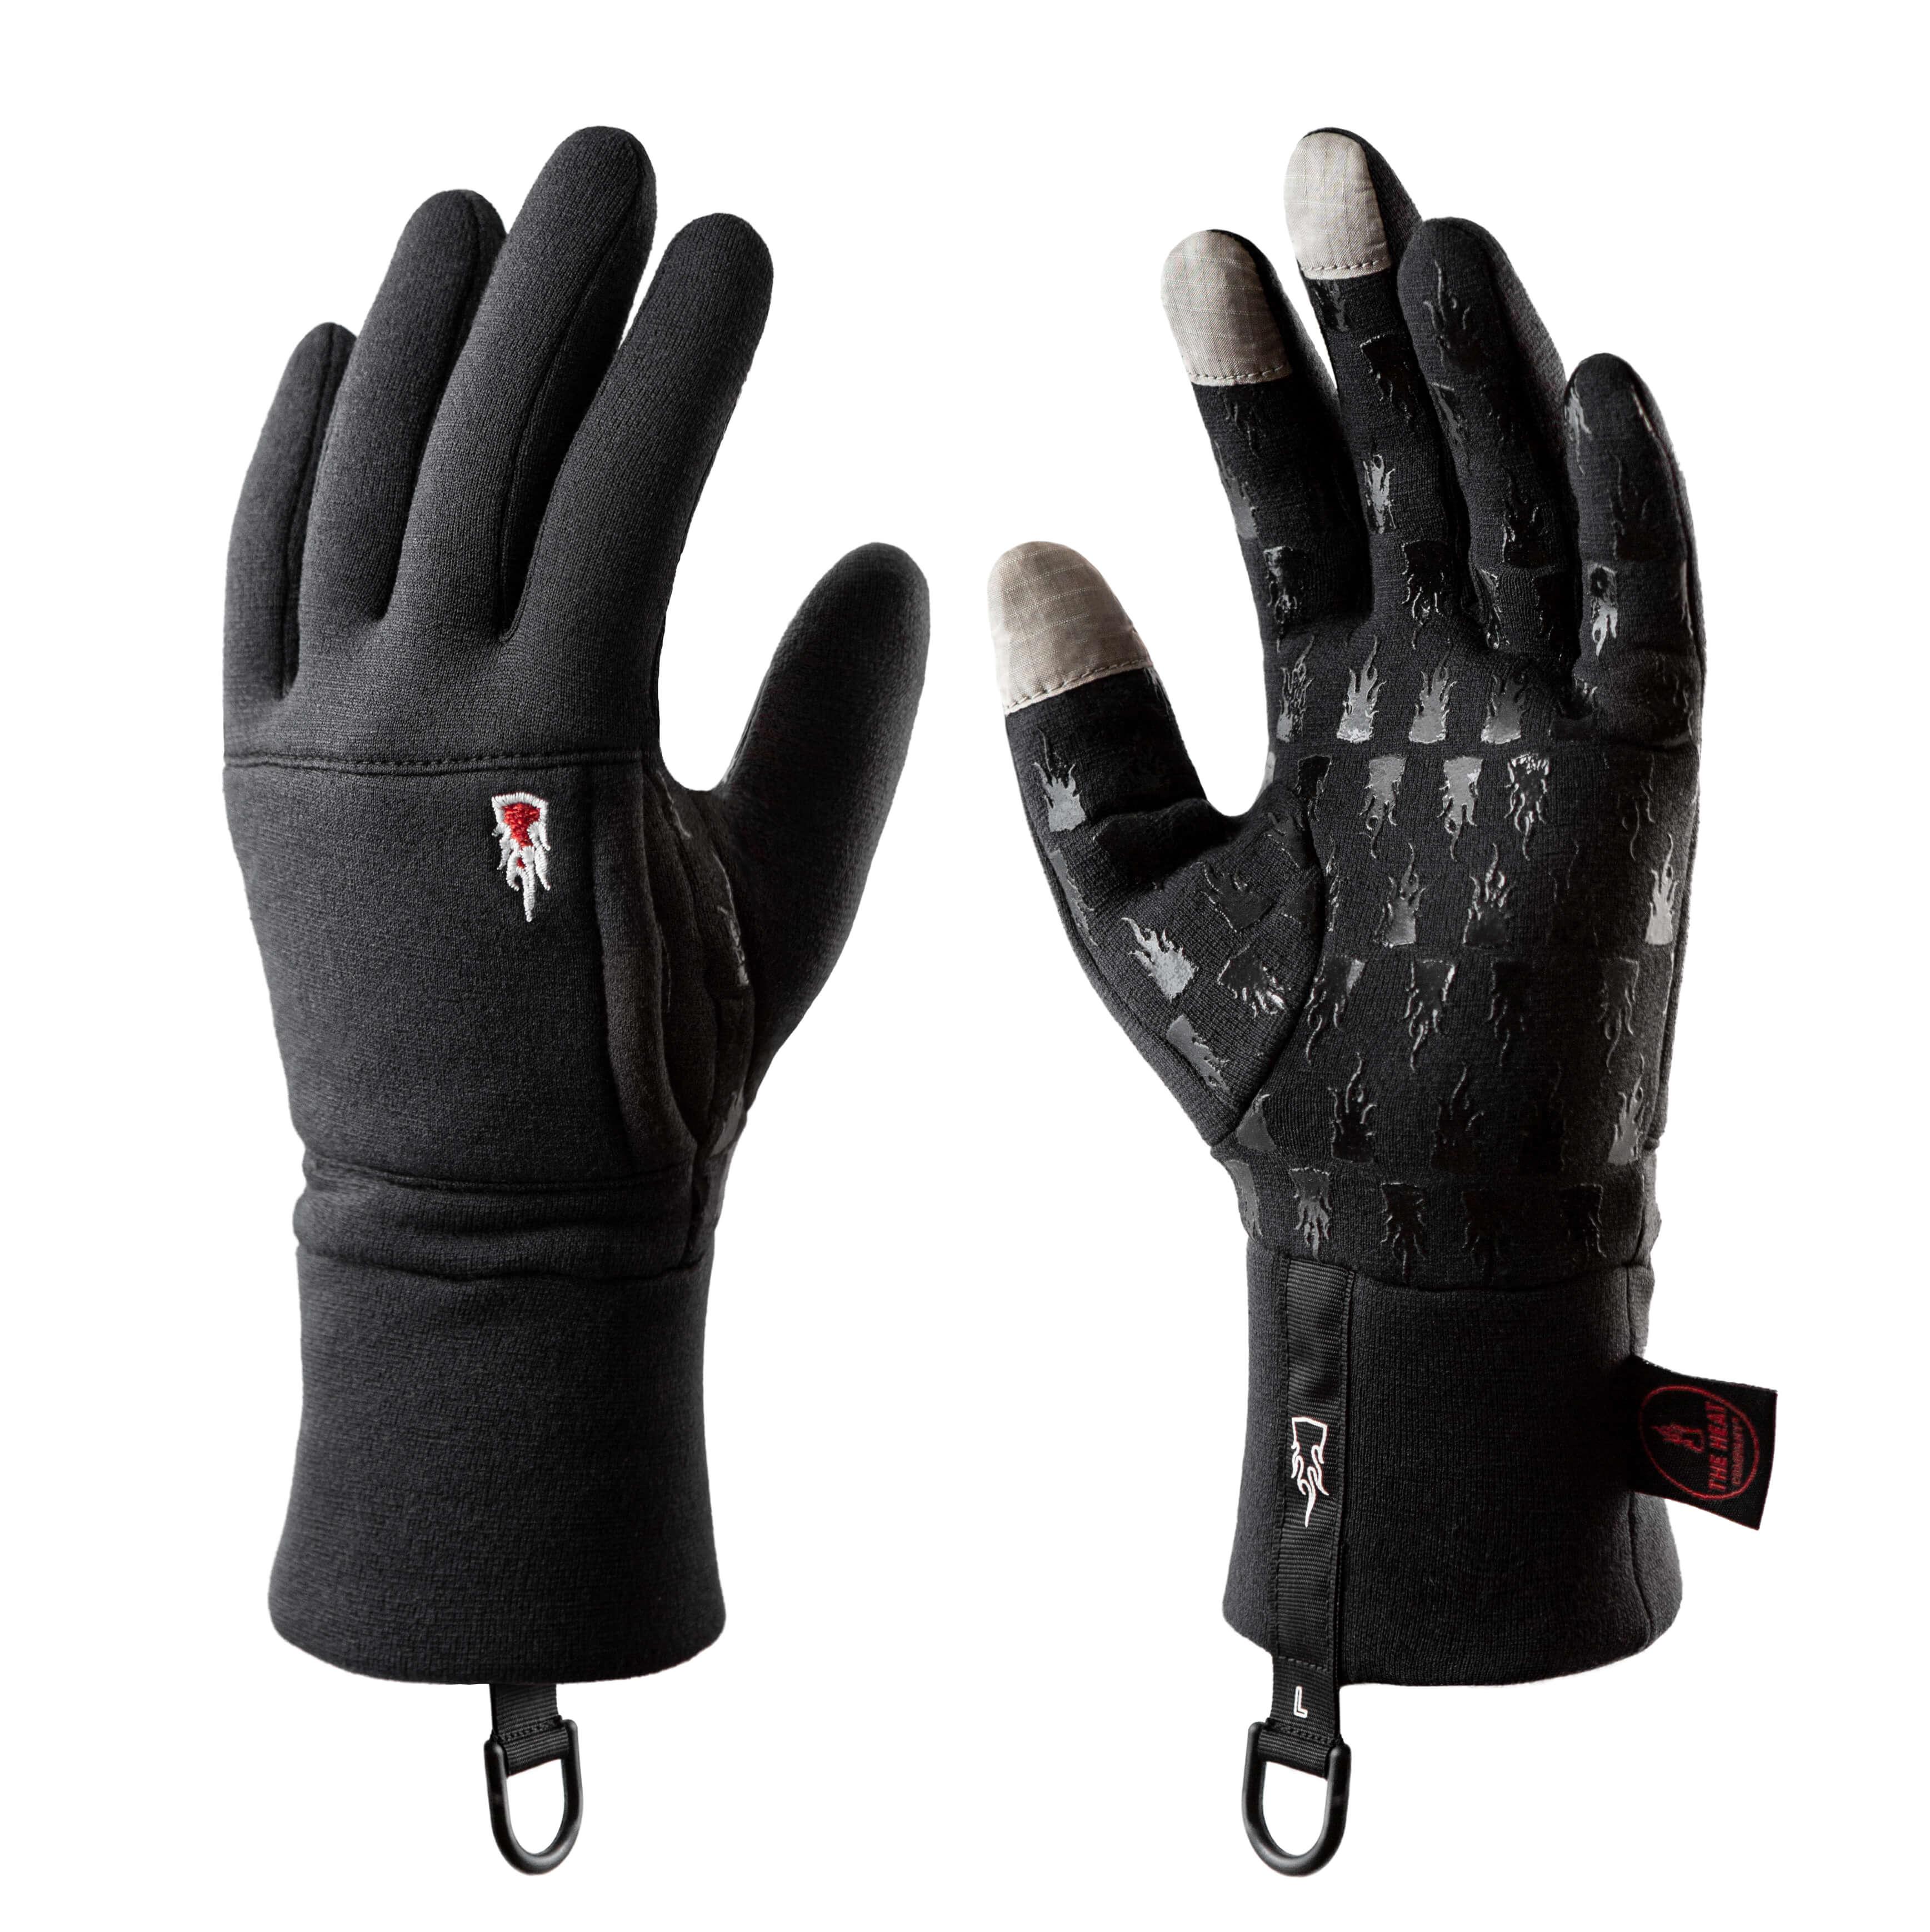 Merino Liner Pro 1st Layer Gloves The Heat Company